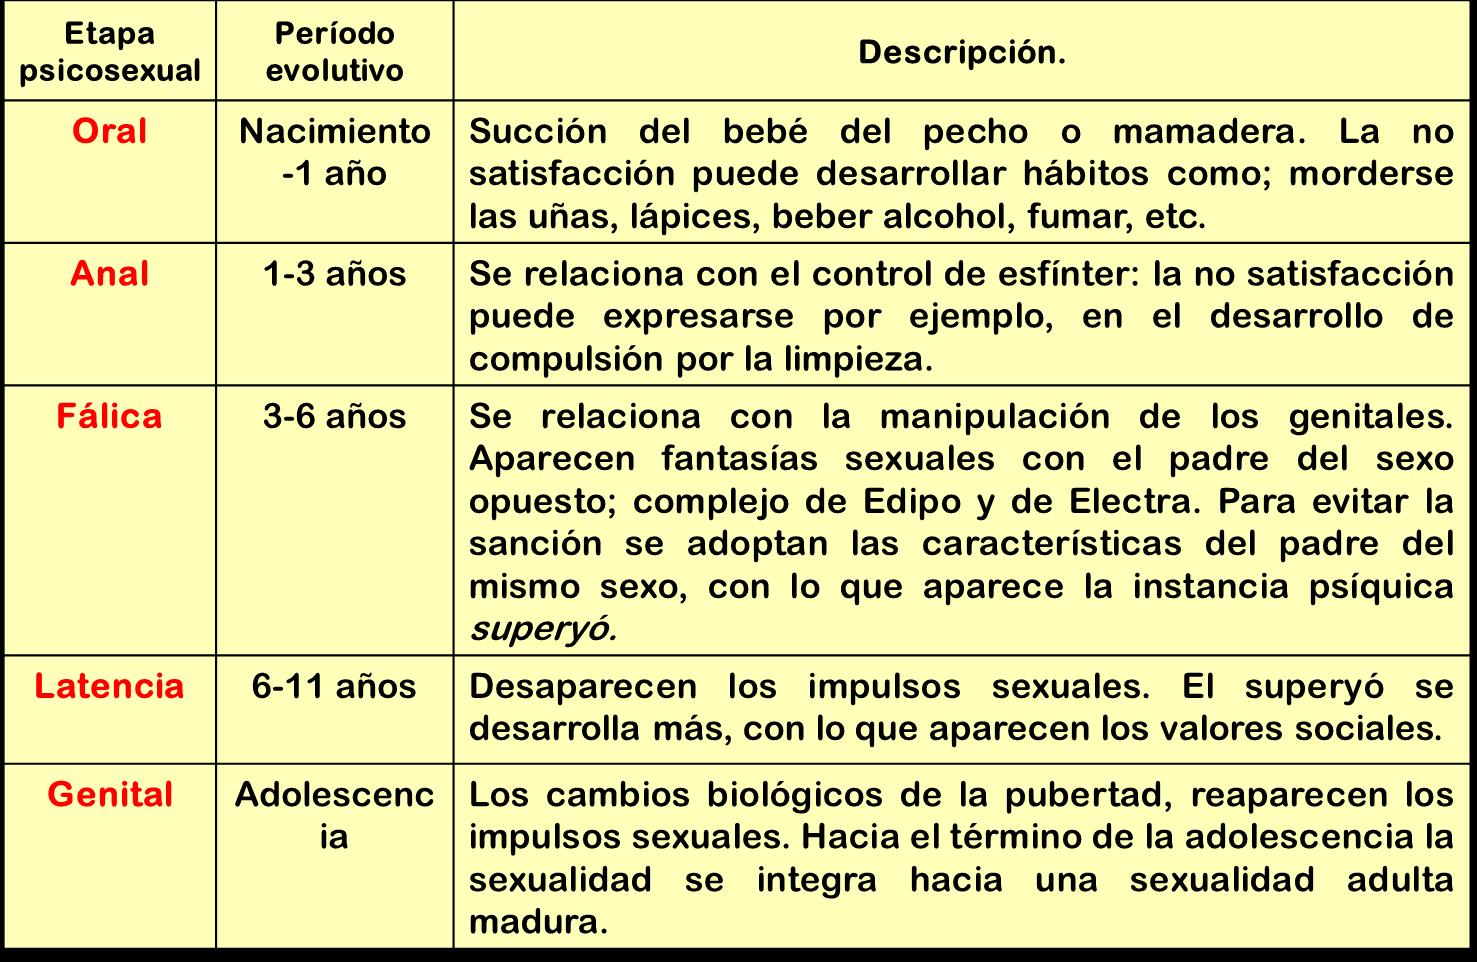 desarrollo sexual de Etapas